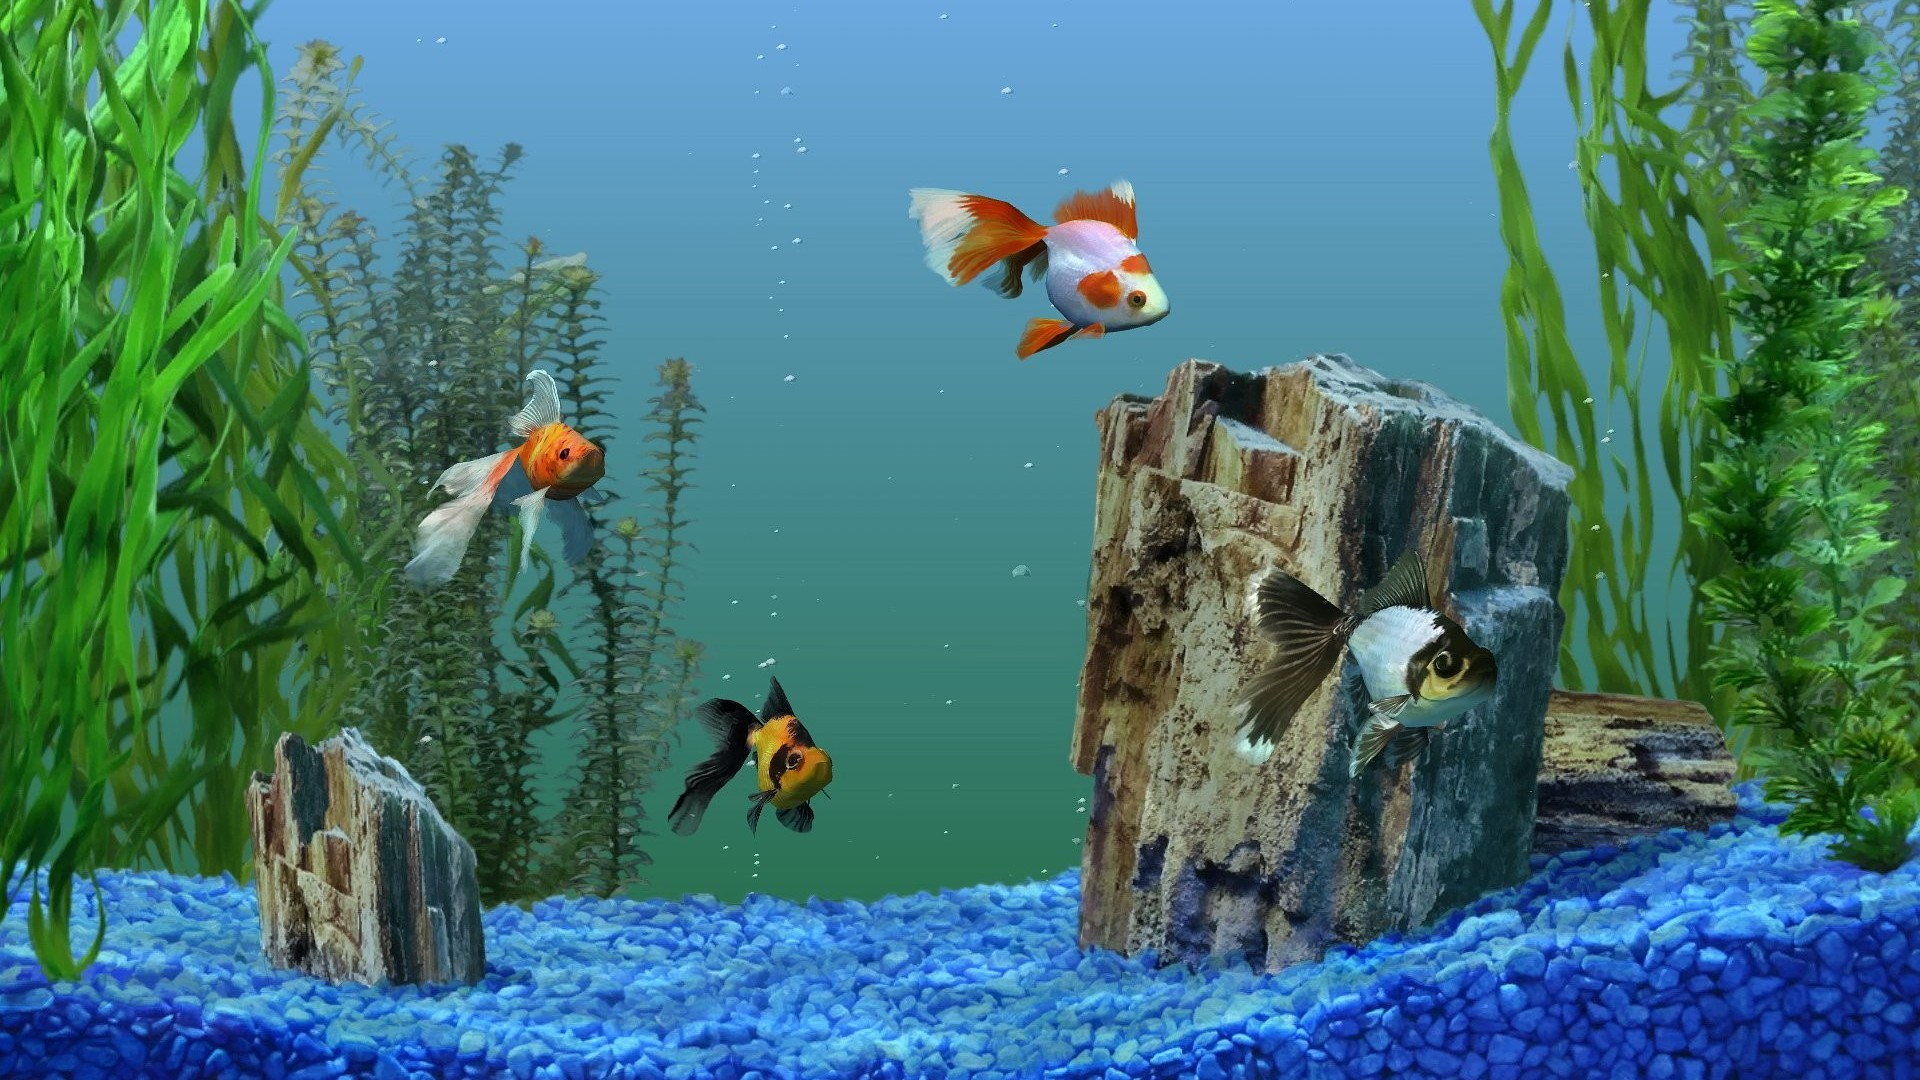 Merry Christmas Desktop Wallpaper 3d Free Download Aquarium Wallpapers Pixelstalk Net